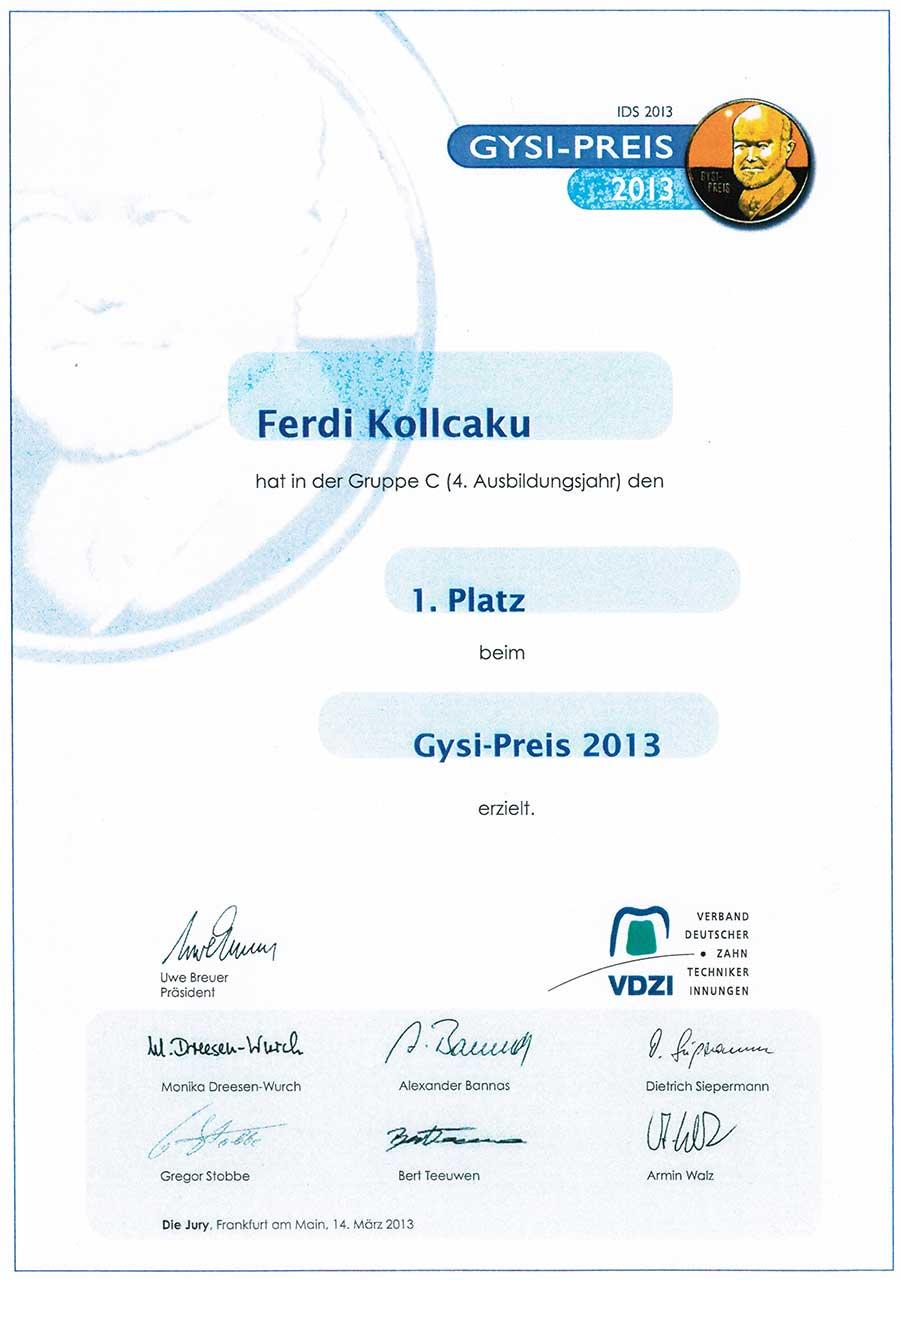 Gysi Preis für Ferdi Kollcuka